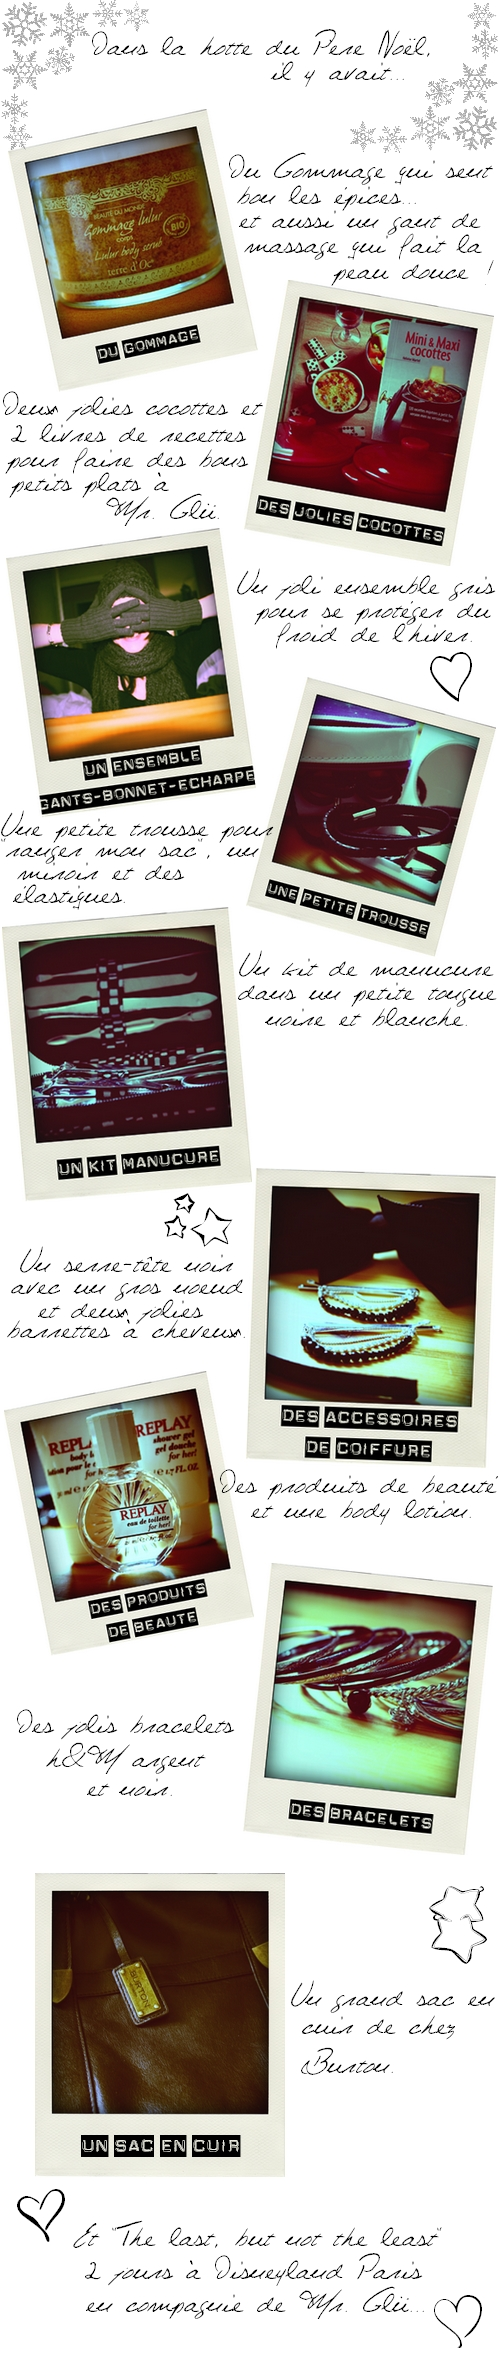 http://anadyomene.cowblog.fr/images/cadeaux.jpg